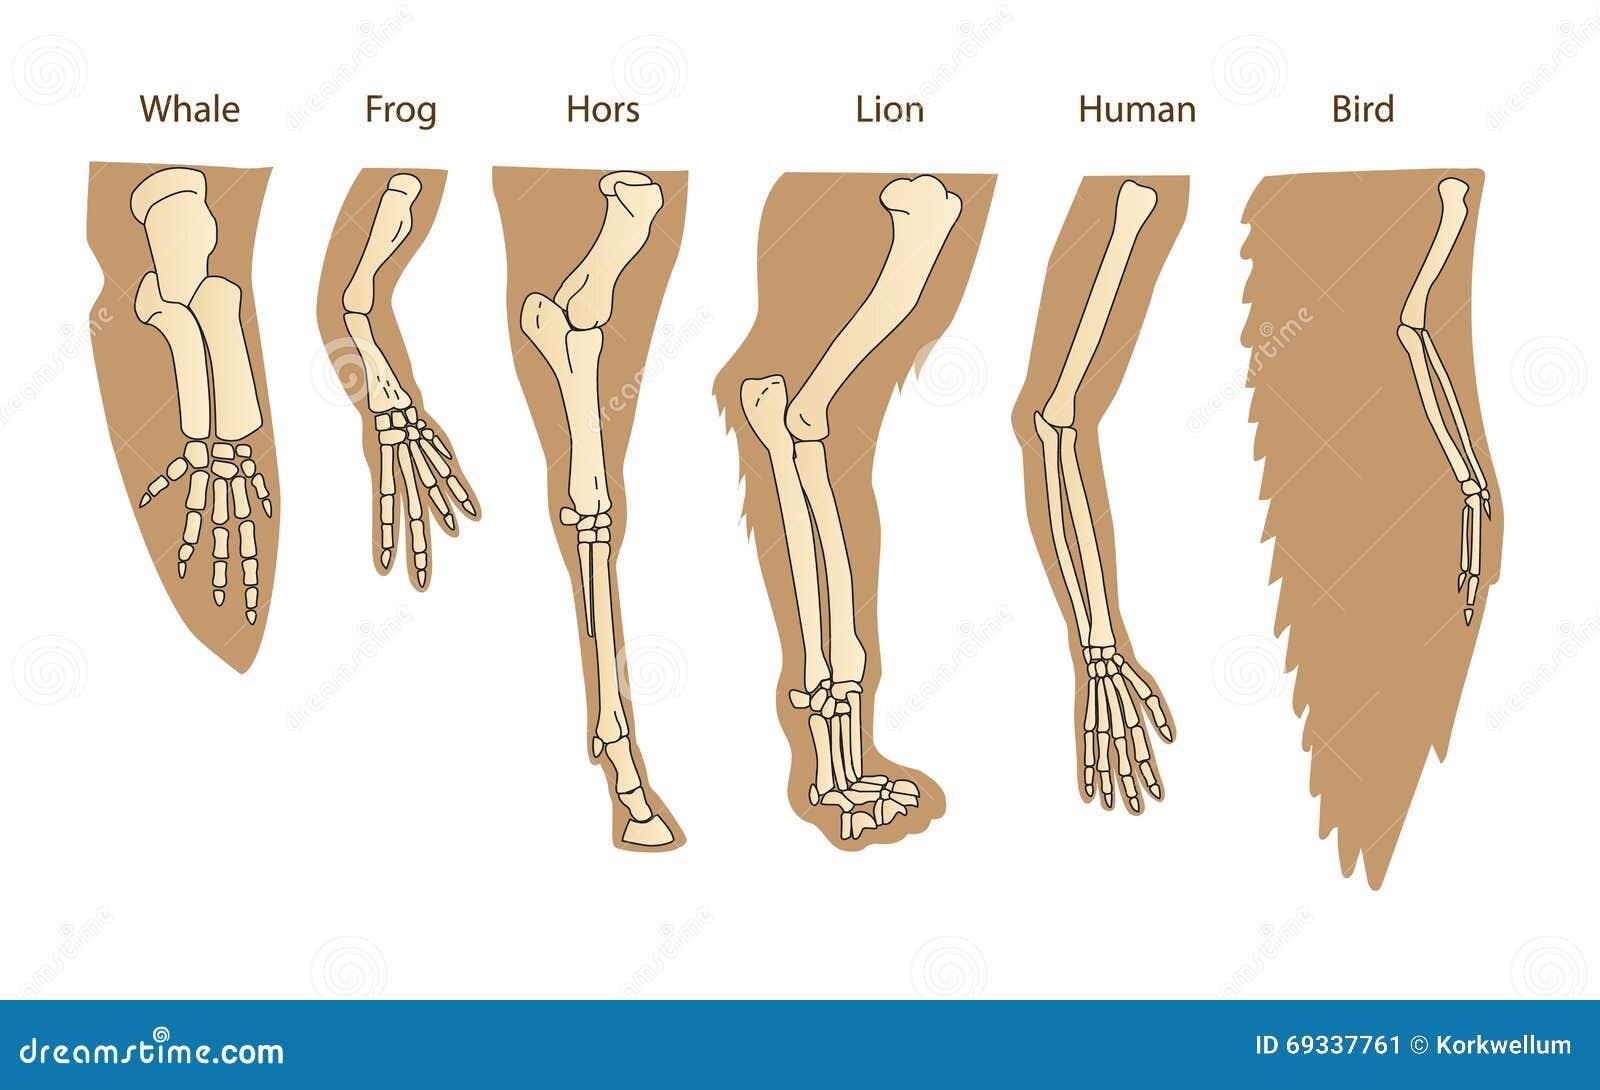 Fancy Origin Definition Anatomy Ideas - Human Anatomy Images ...